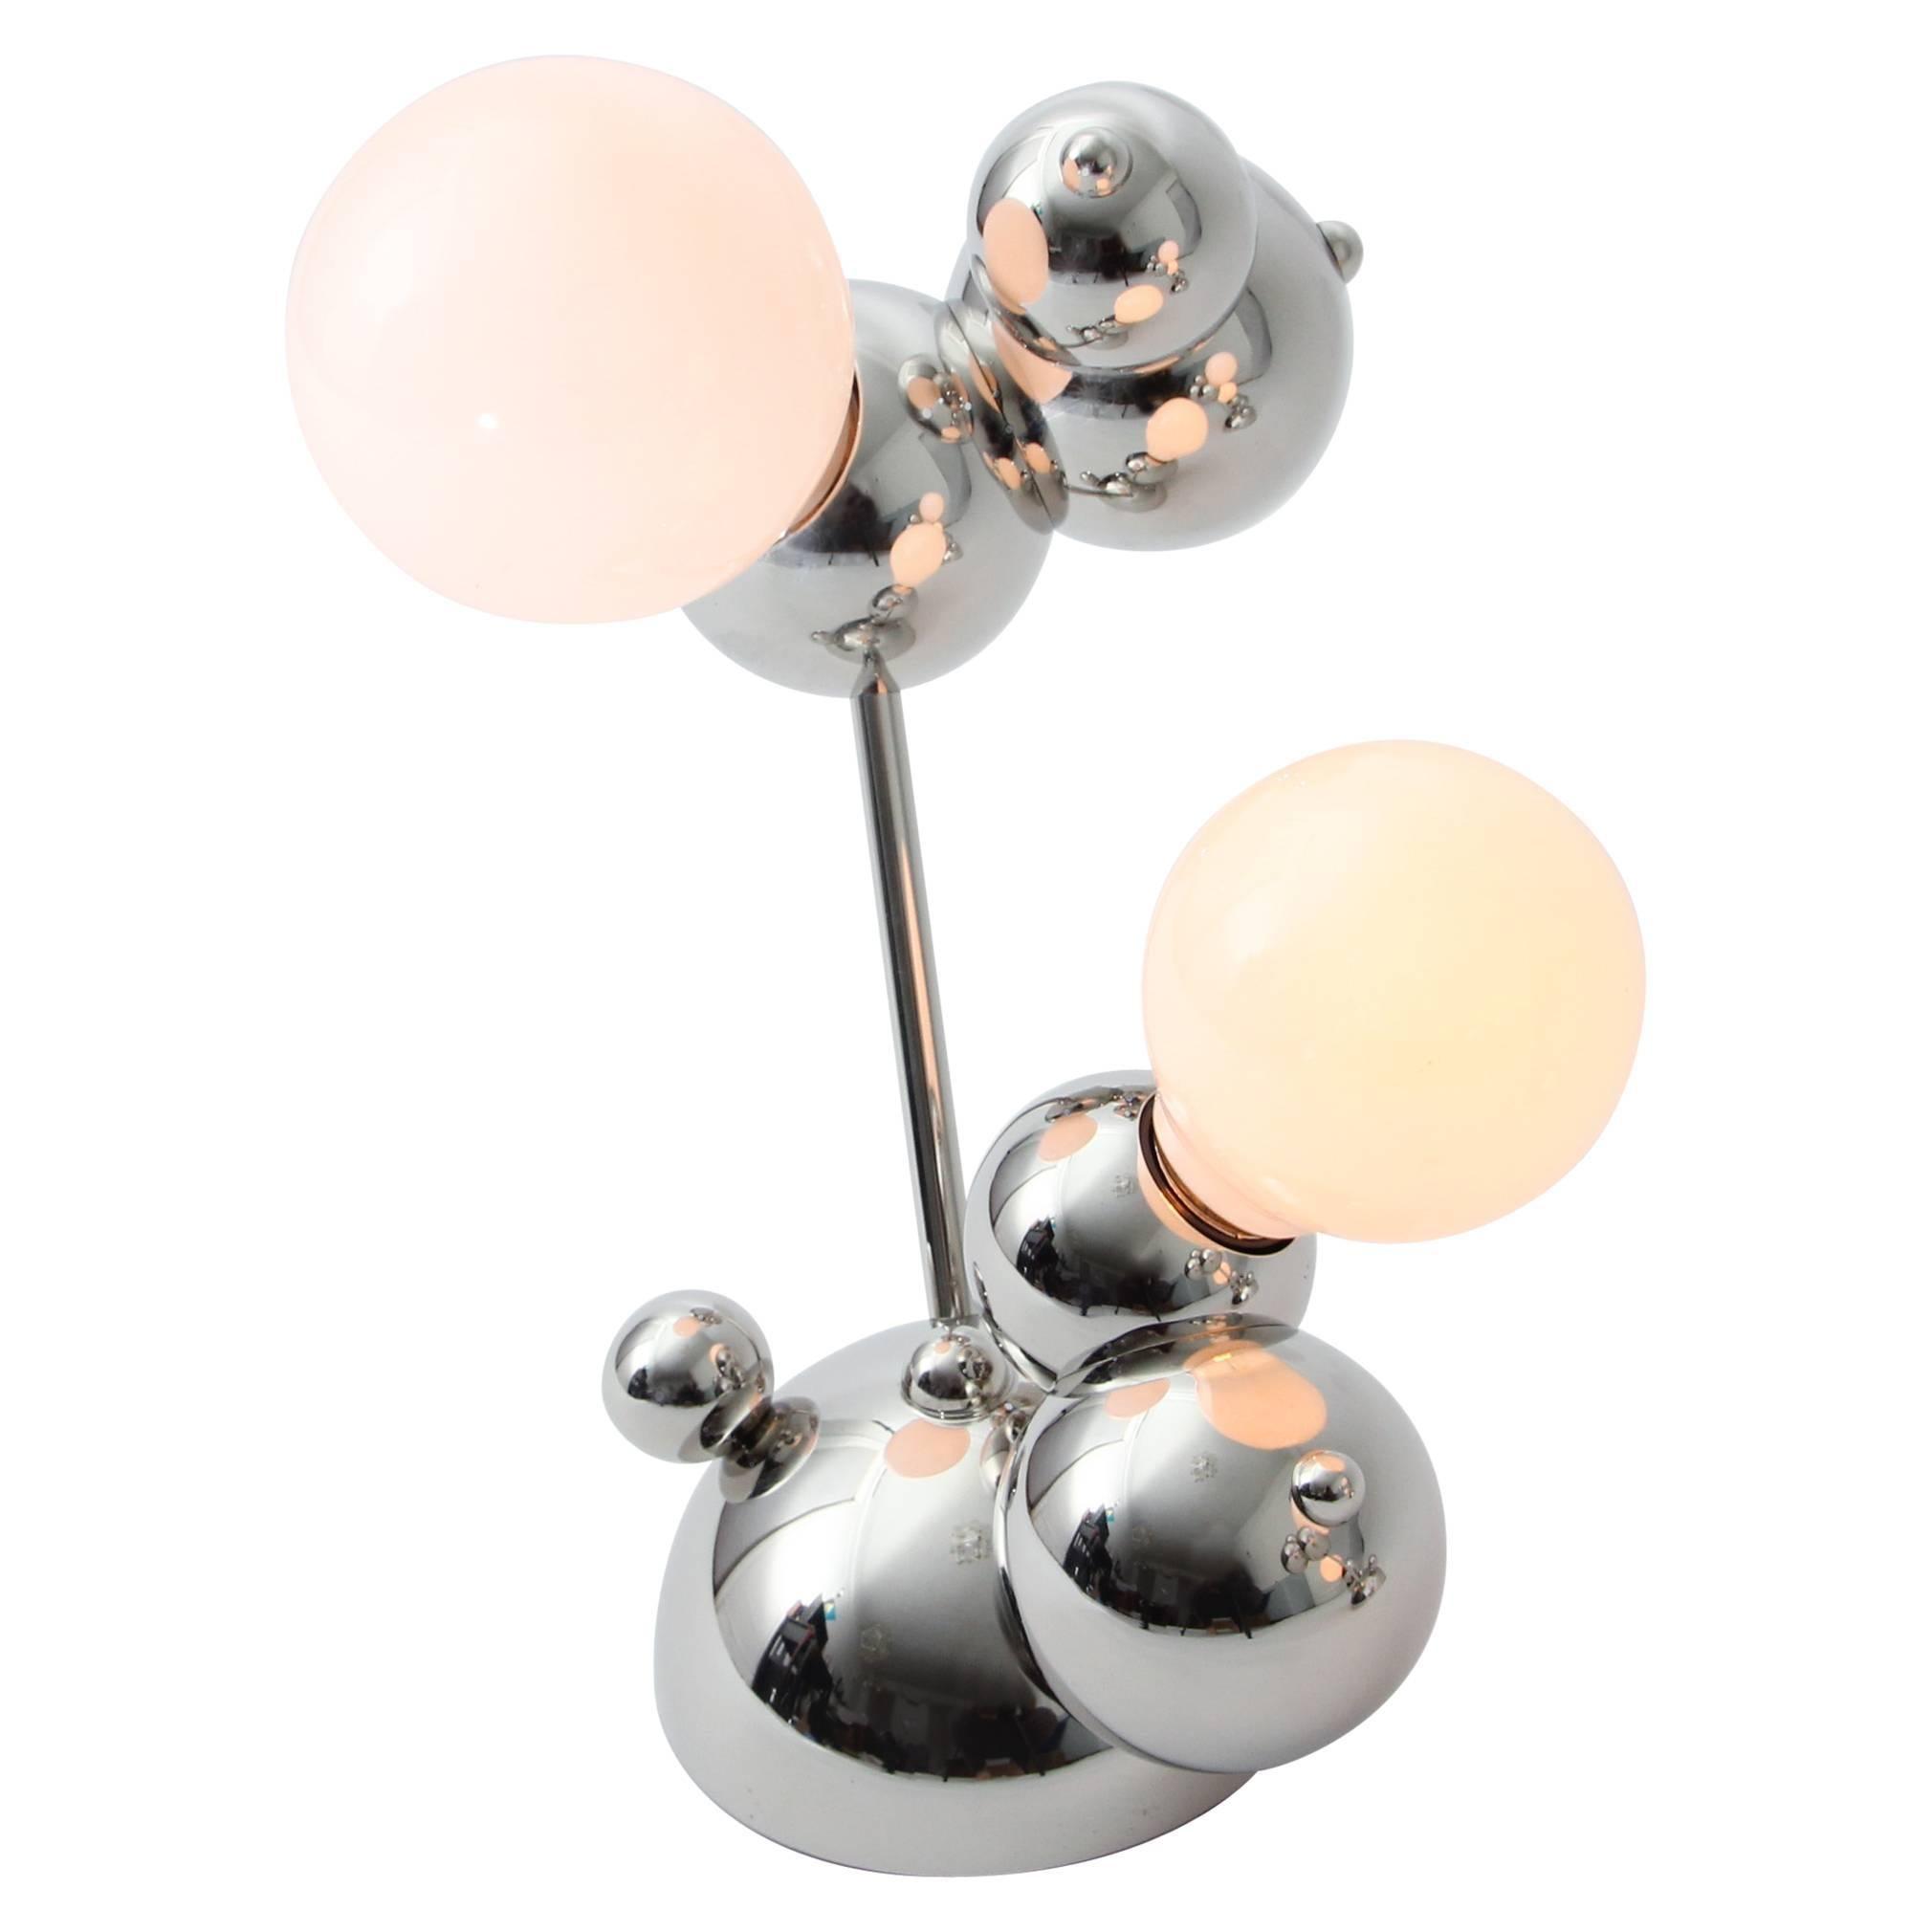 Bubbly 02-Table Lamp, Polished Nickel, Modern Molecular Sculptural Lighting